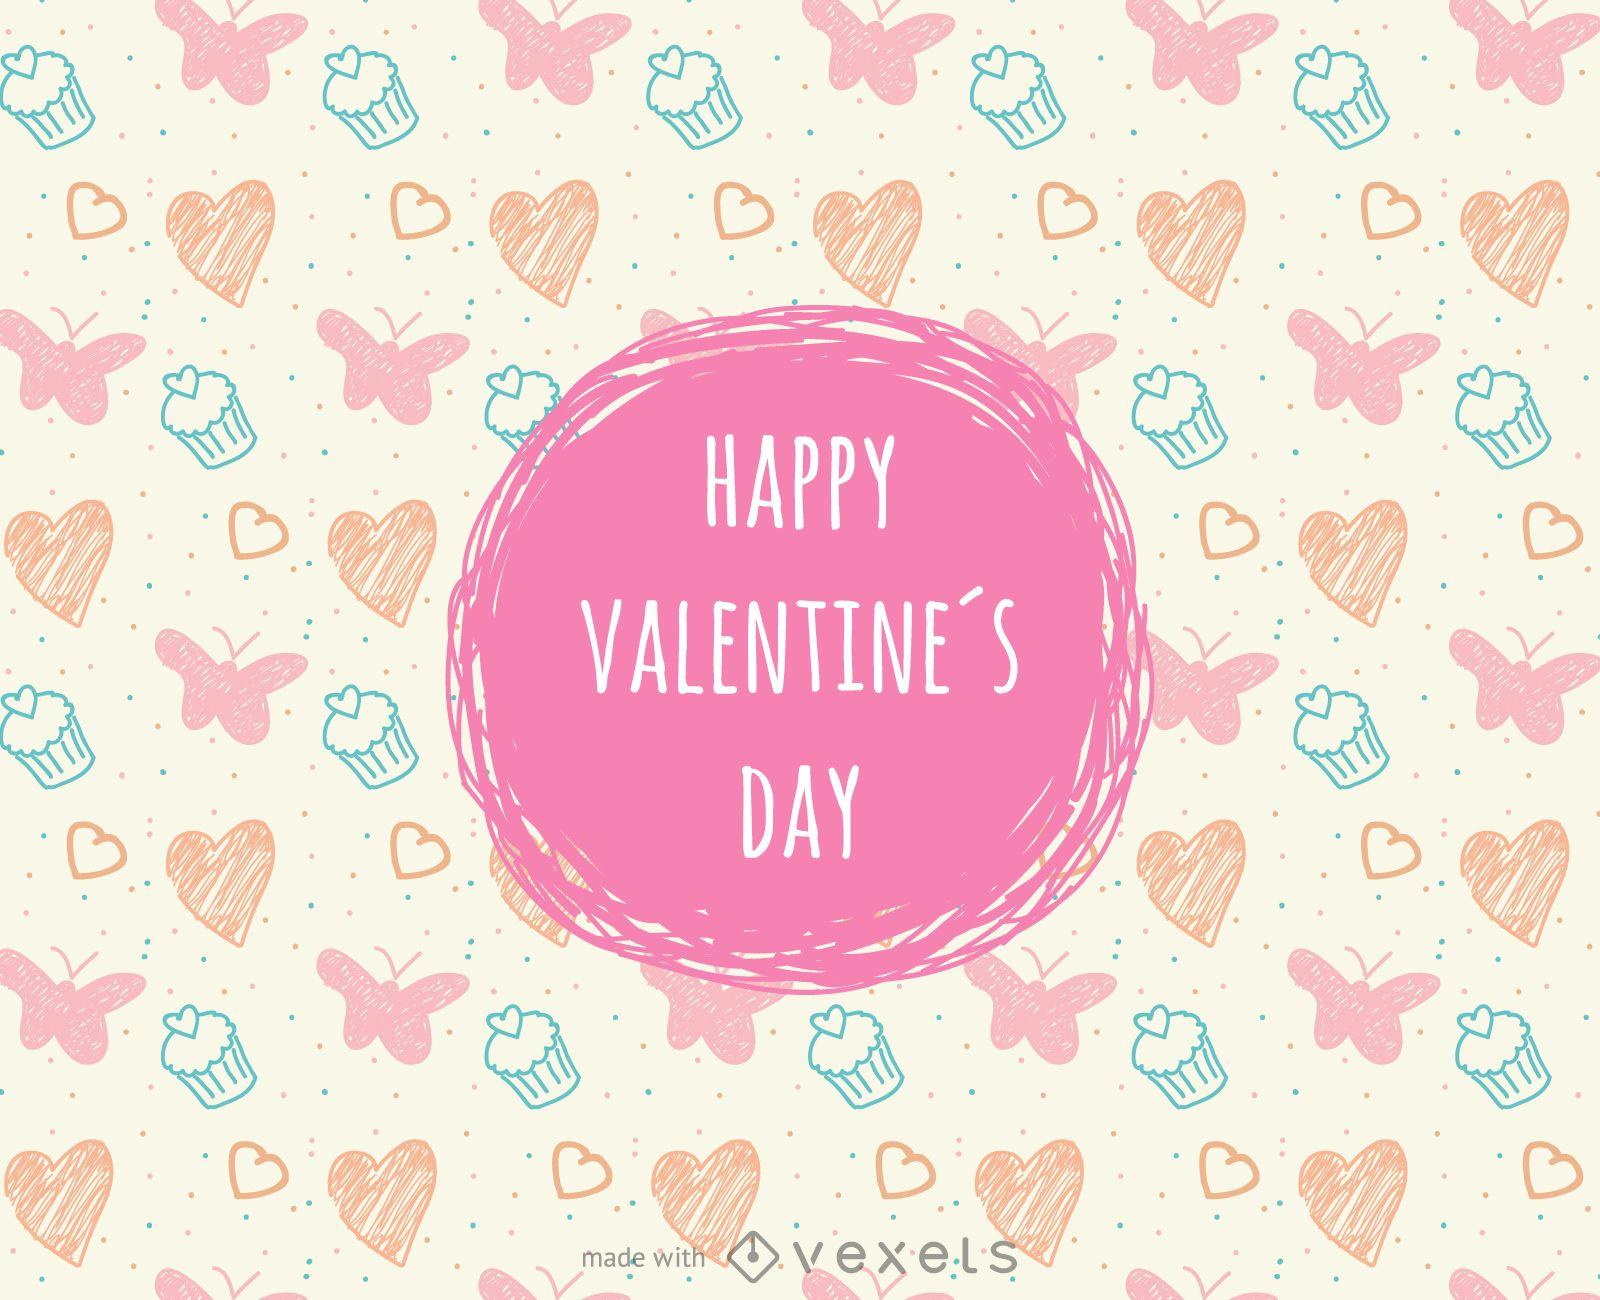 Valentine's Day poster maker